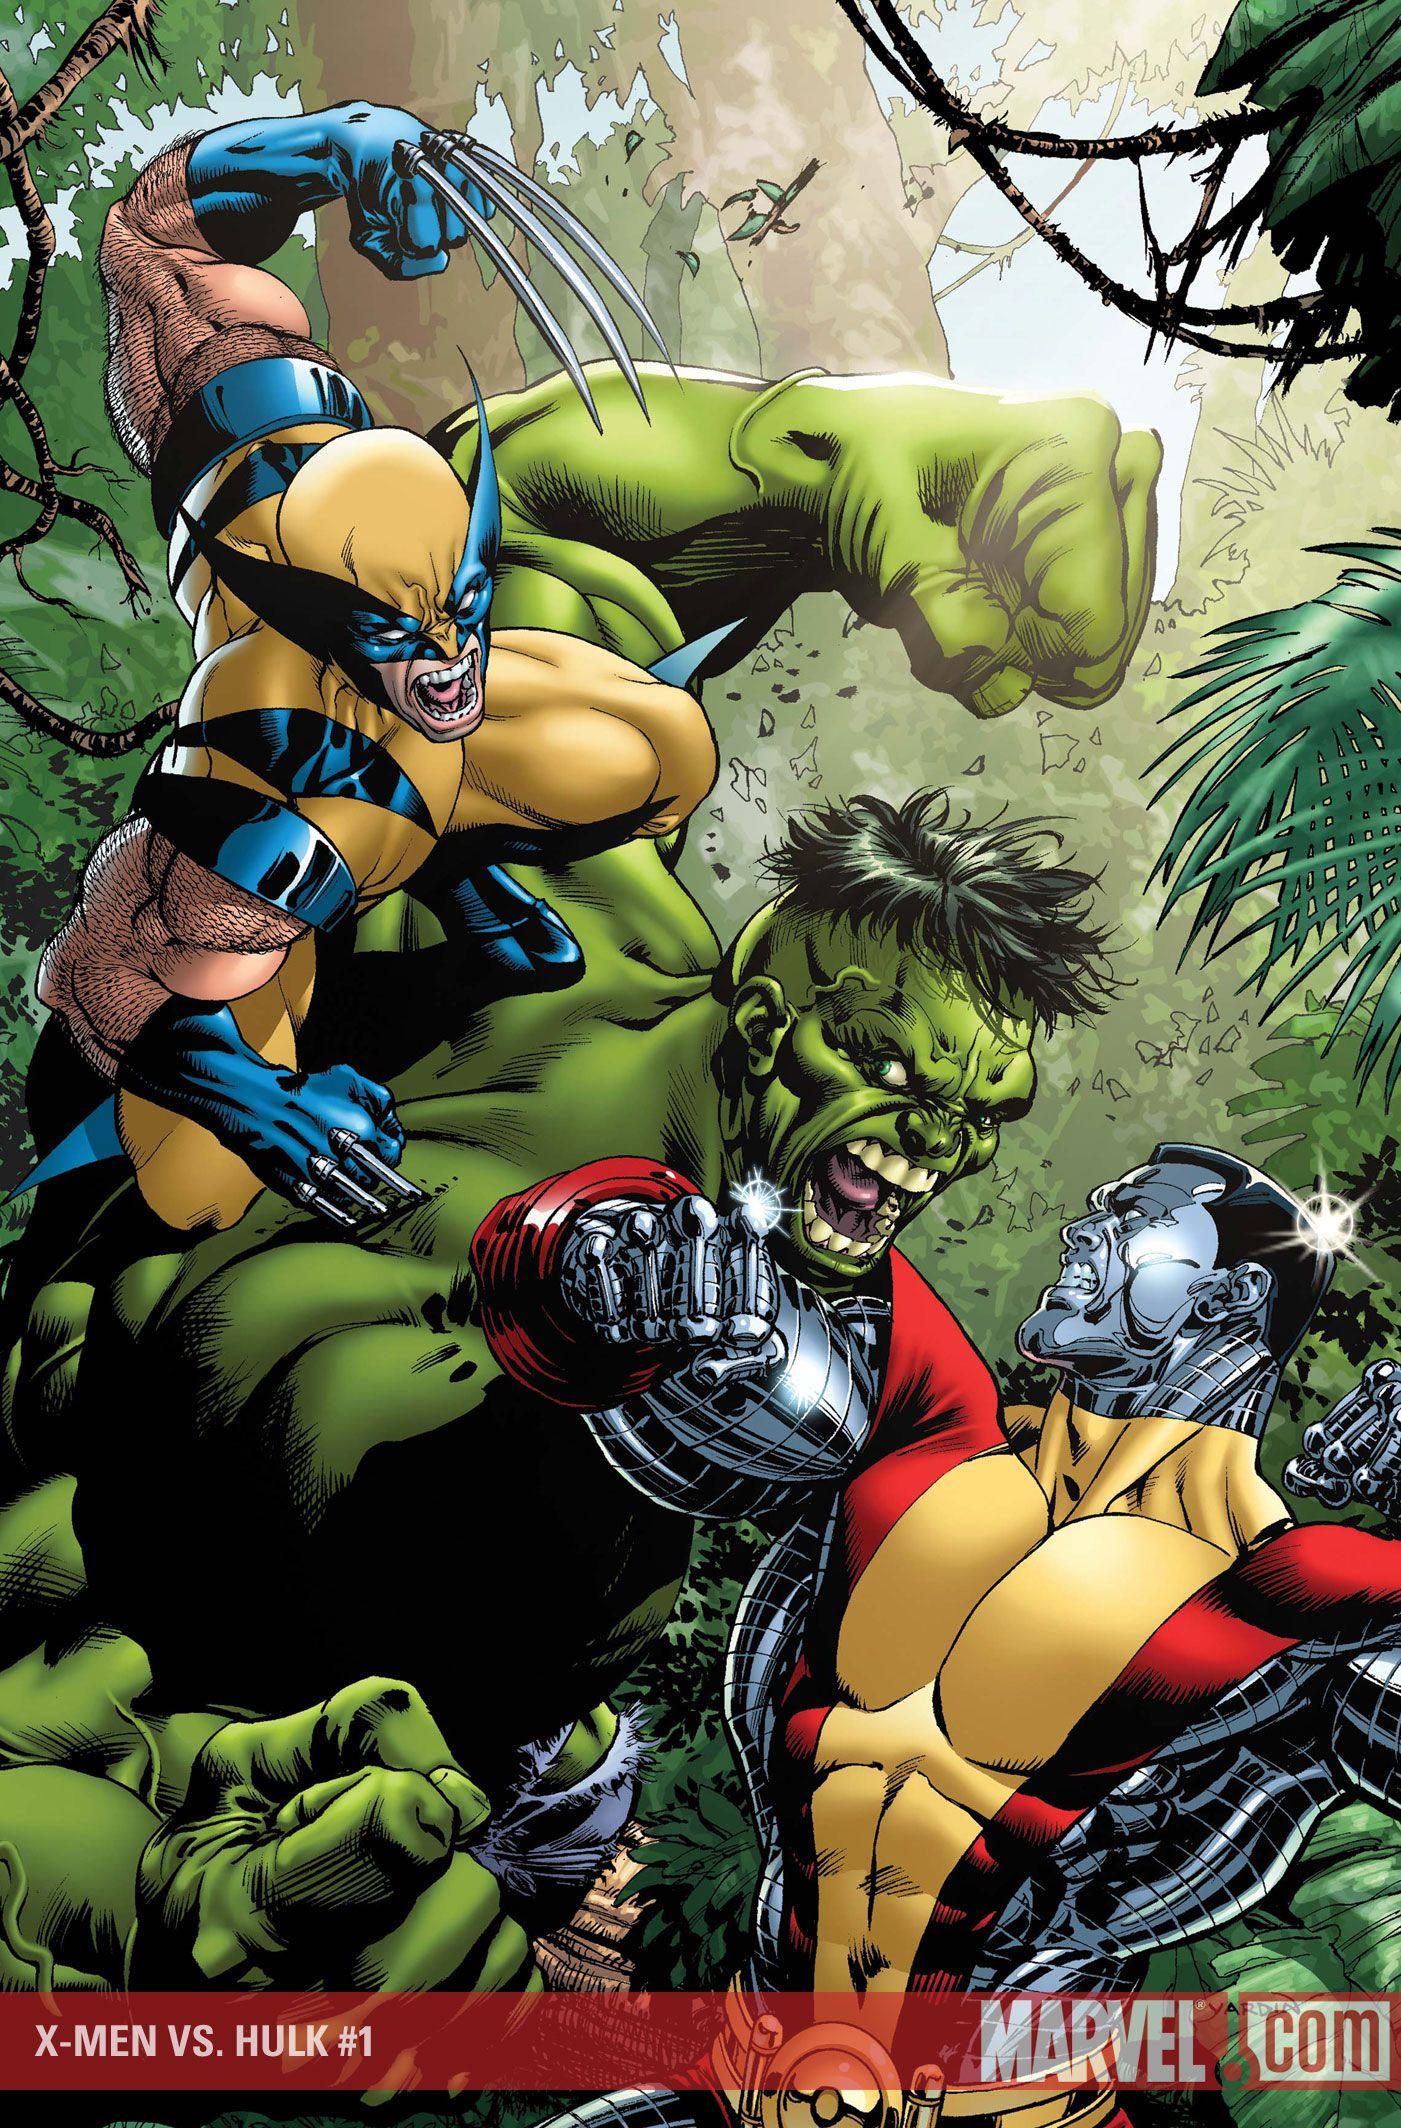 Hulk Vs My Favorite 5 Colossus Wolverine Help Yeah He Needs The X Men Team To Fight The Hulk Or He Ll Get His A Hulk Comic Hulk Marvel Superhero Comic